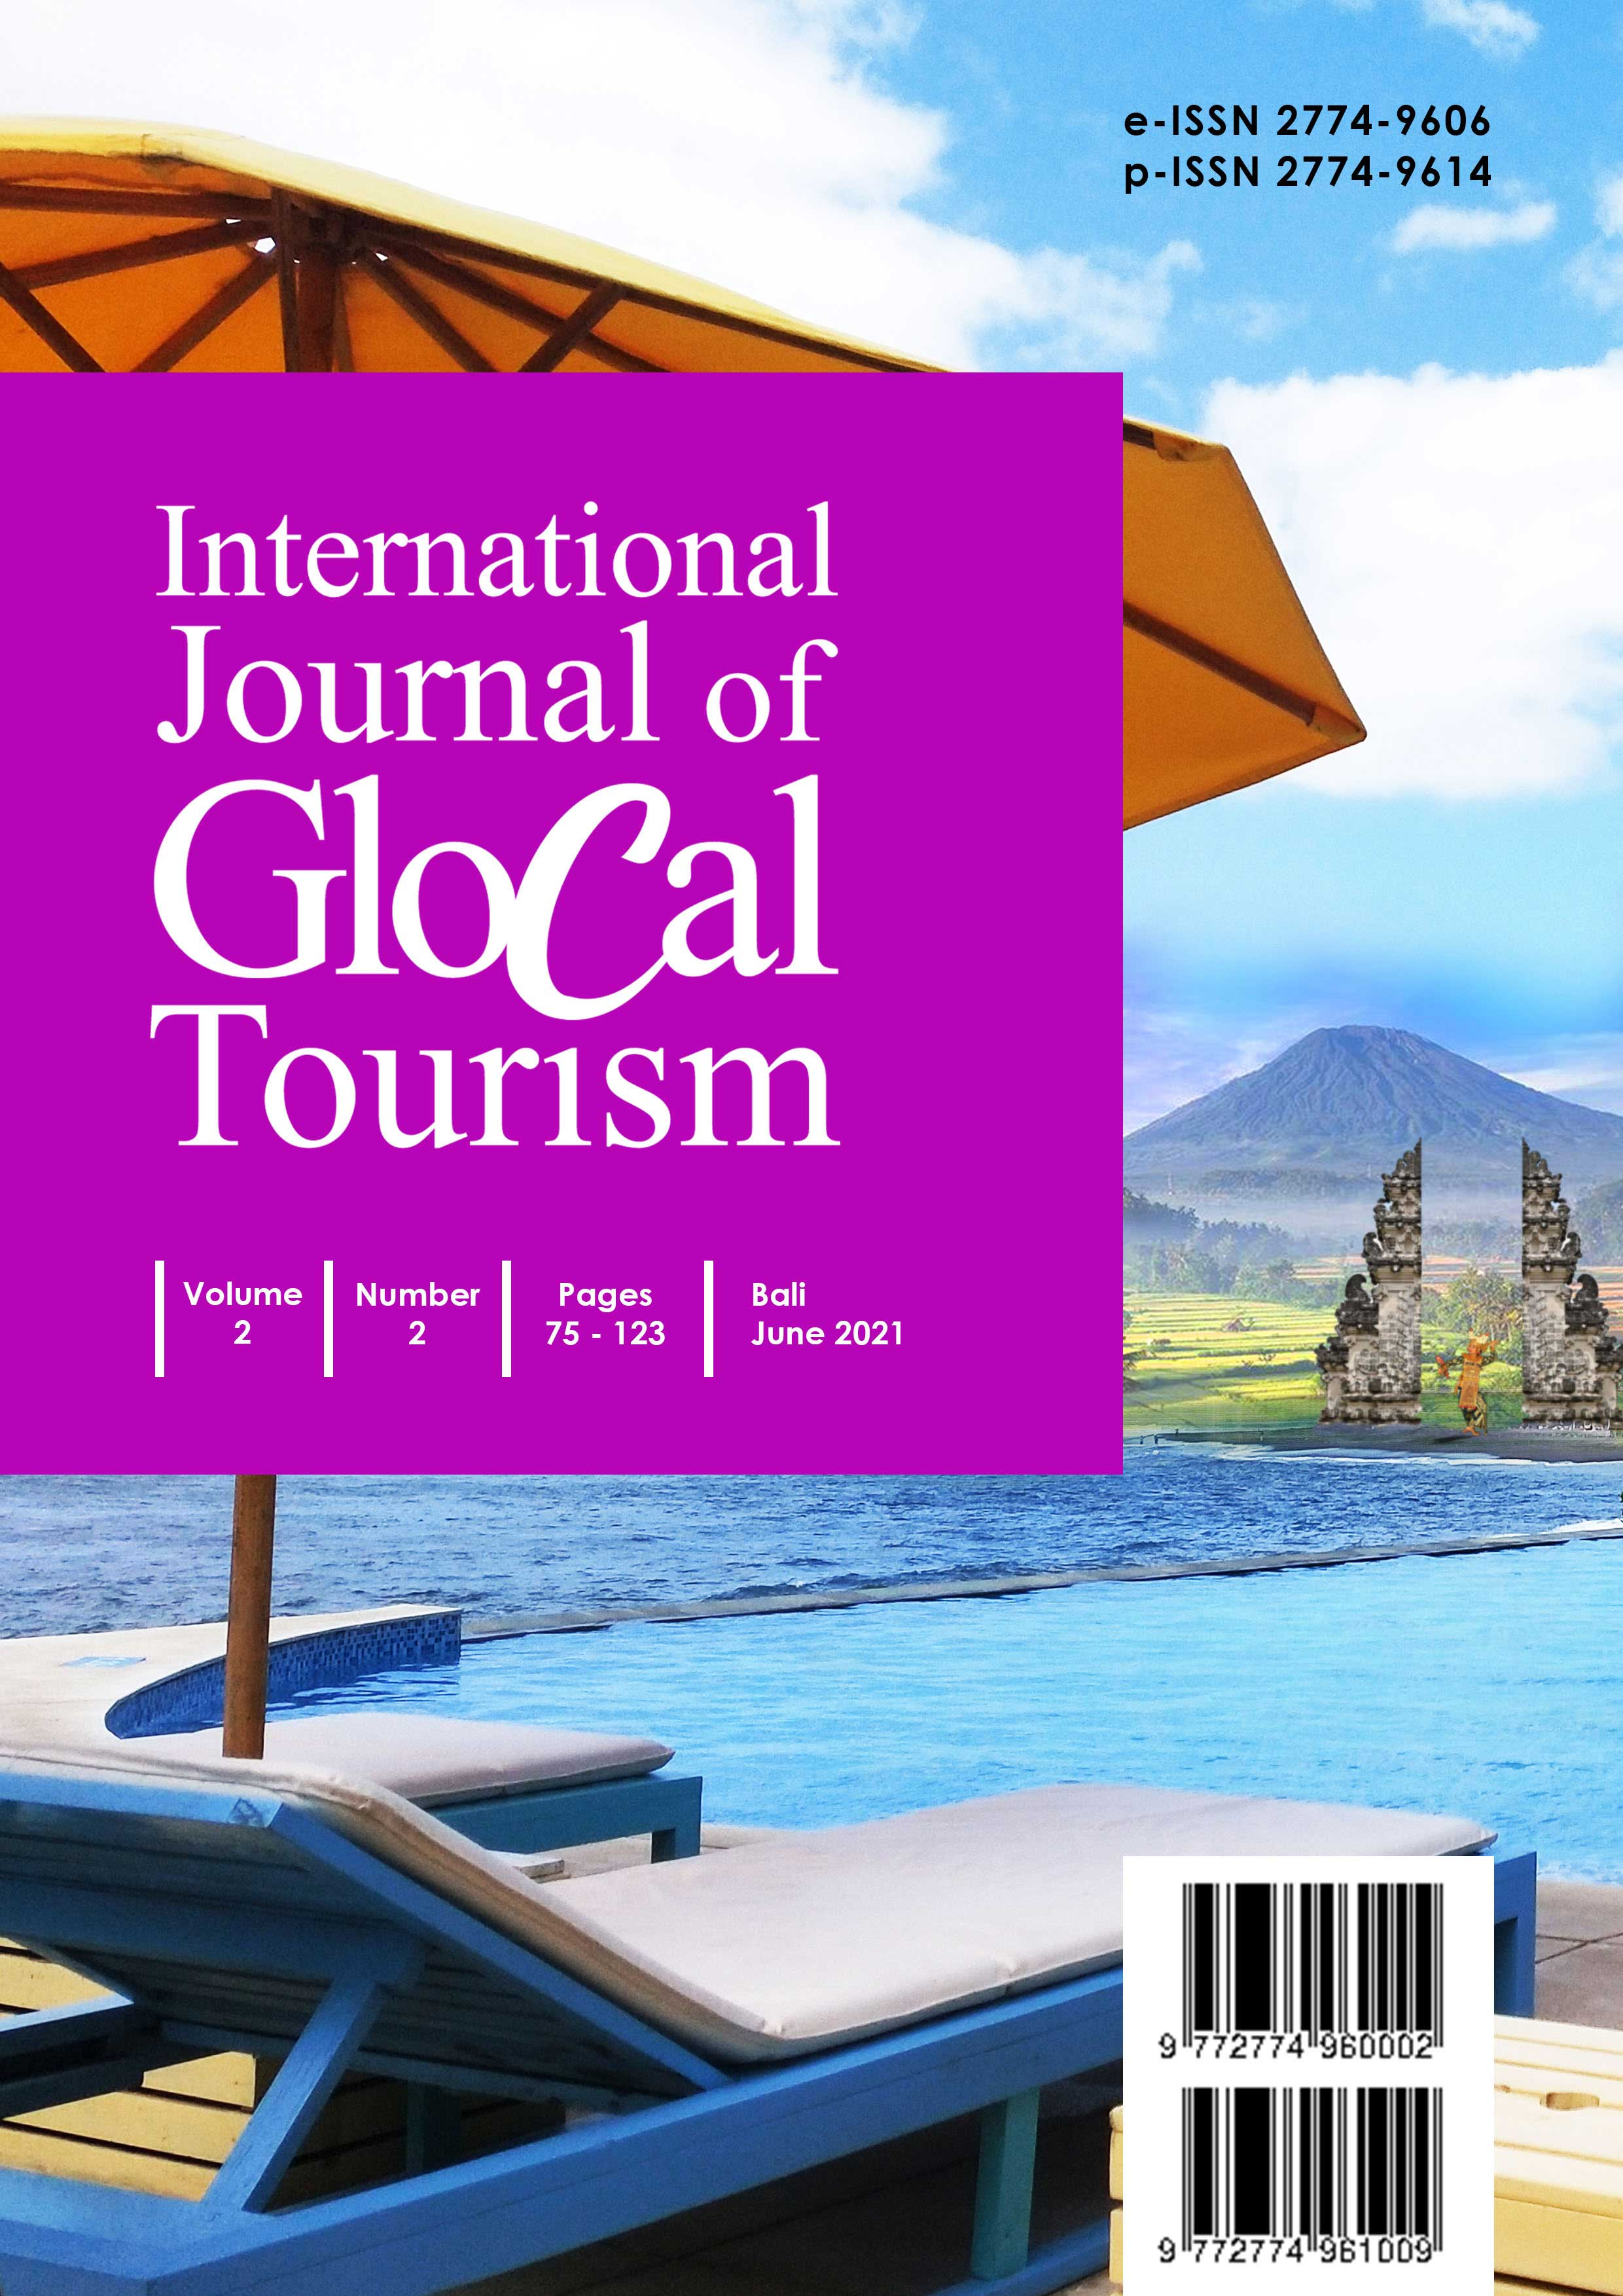 View Vol. 2 No. 2 (2021): International Journal of Glocal Tourism - June 2021